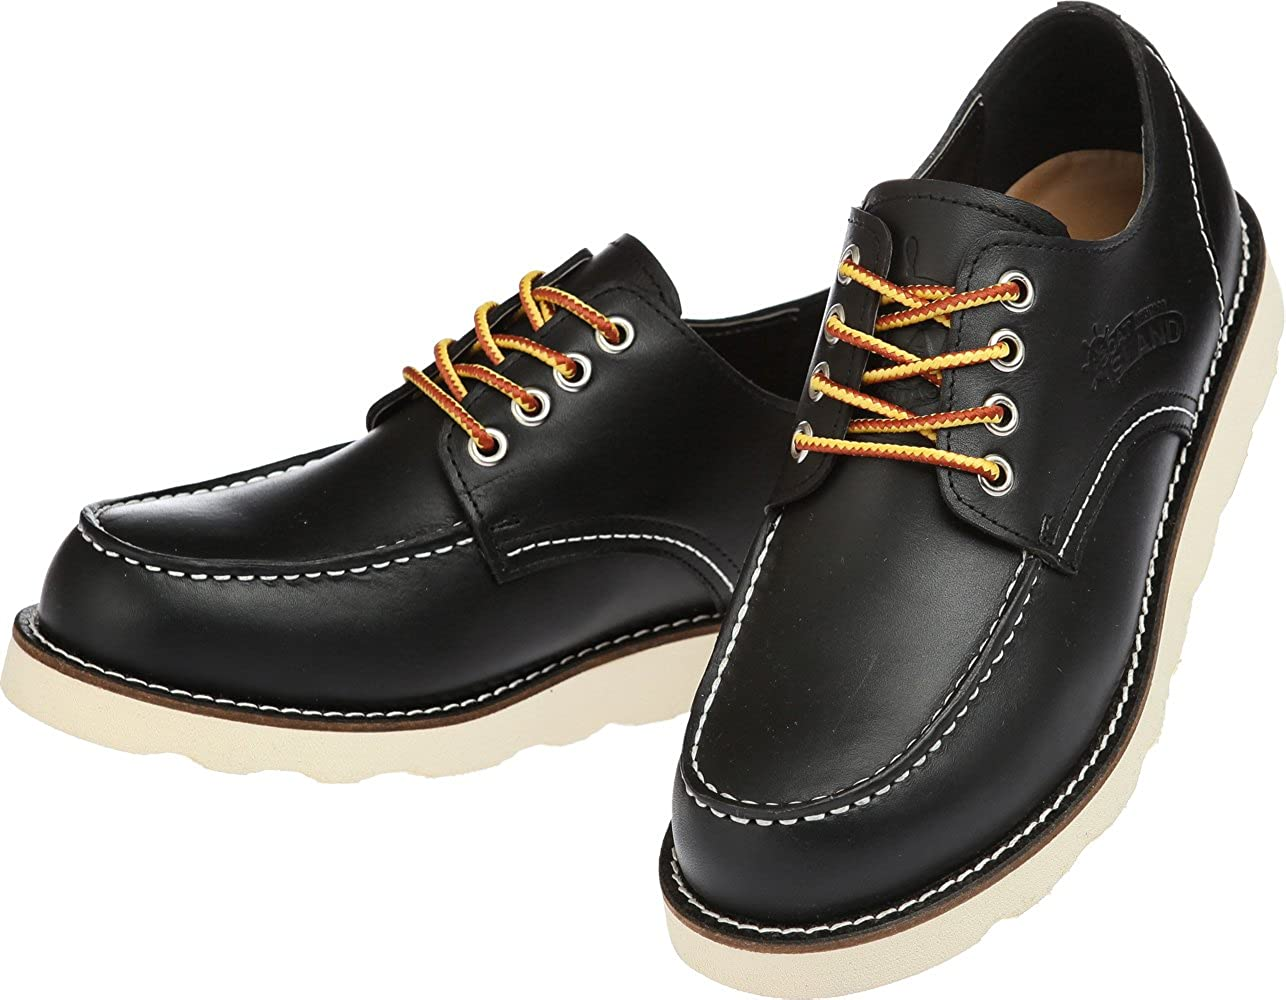 Boat Island Heritage Men Original Classic Leather Dress D Shoes Boots Chukka Slip On Dark Brown